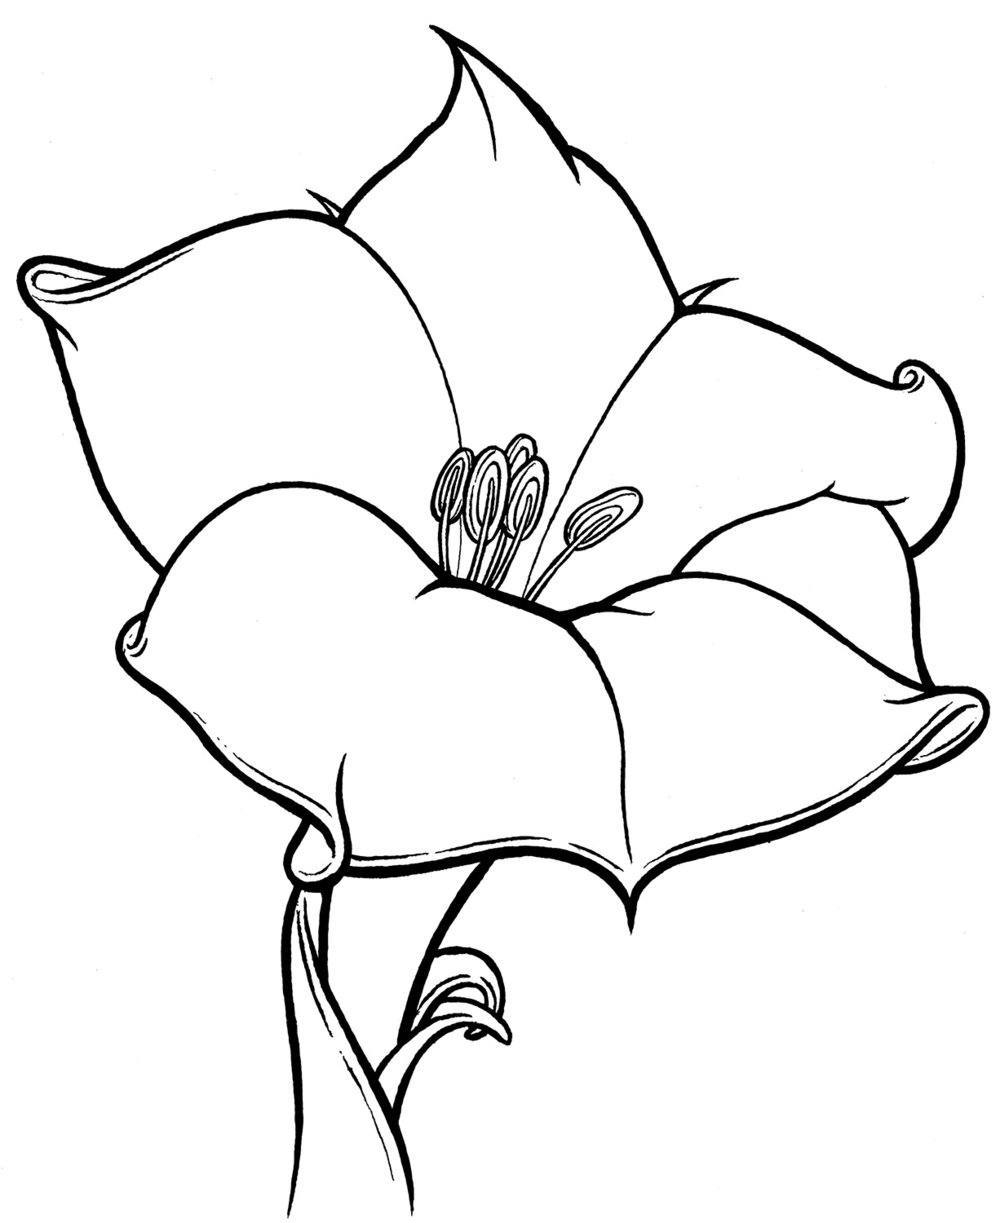 lily-web.jpg